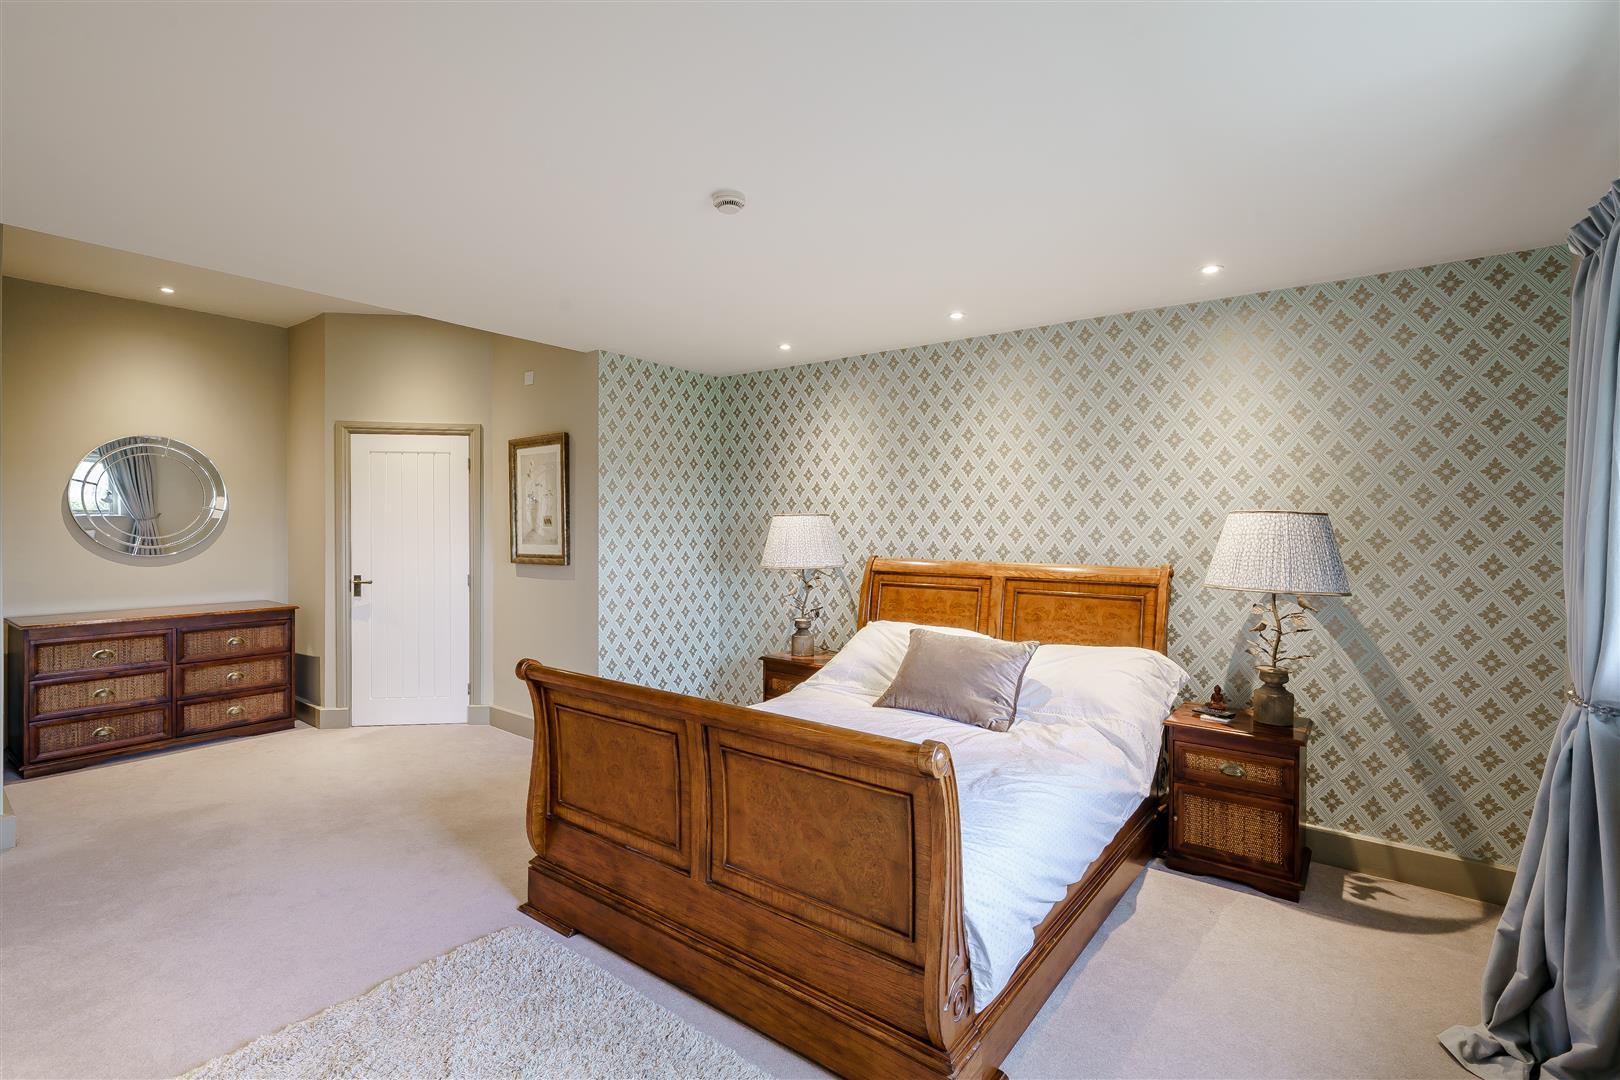 Rowstock Manor - Gallery Image 20 - Bedroom 2